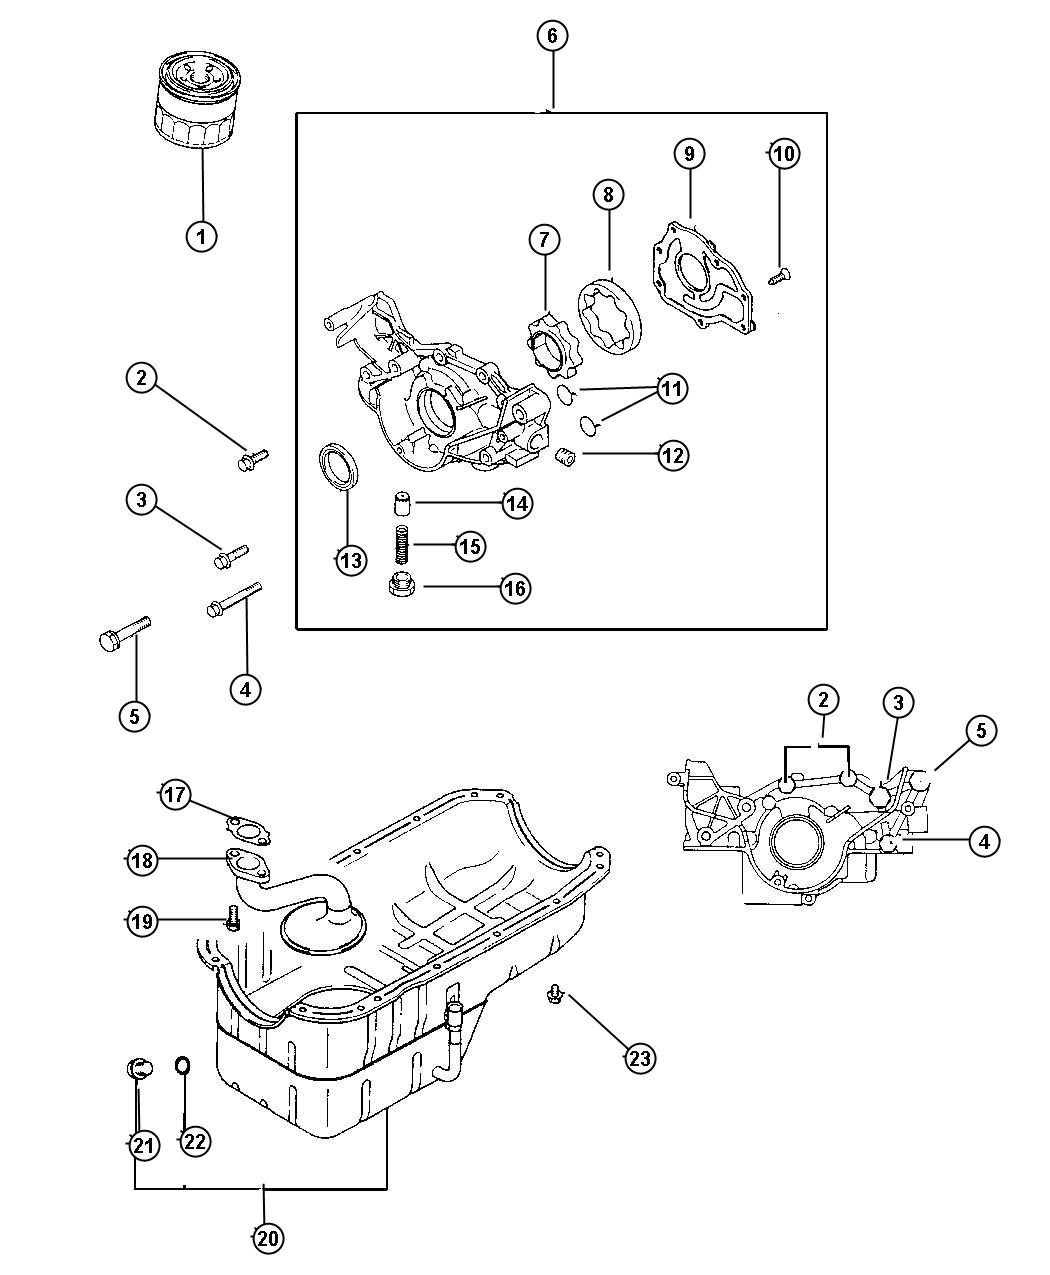 Dodge Avenger O ring. Engine front case. (15.3). Oiling